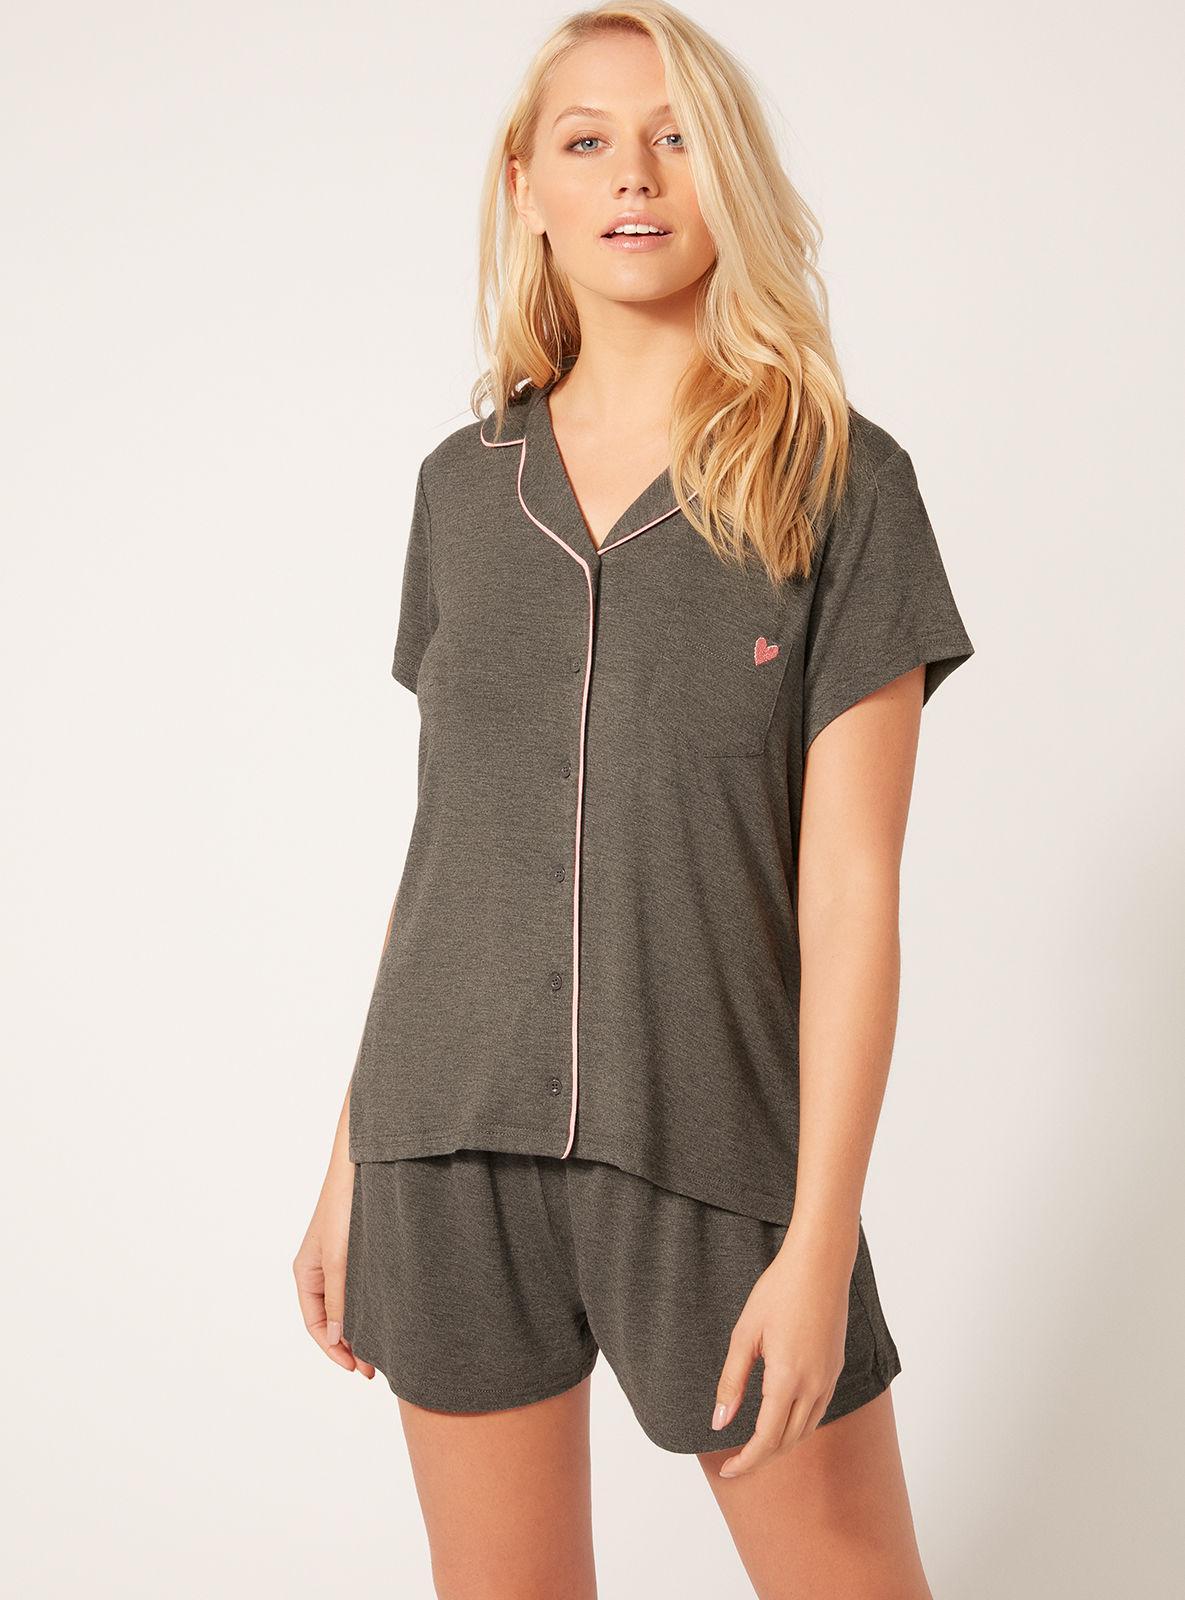 419212b026 Lyst - Boux Avenue Jersey Short Pyjama Set in Gray